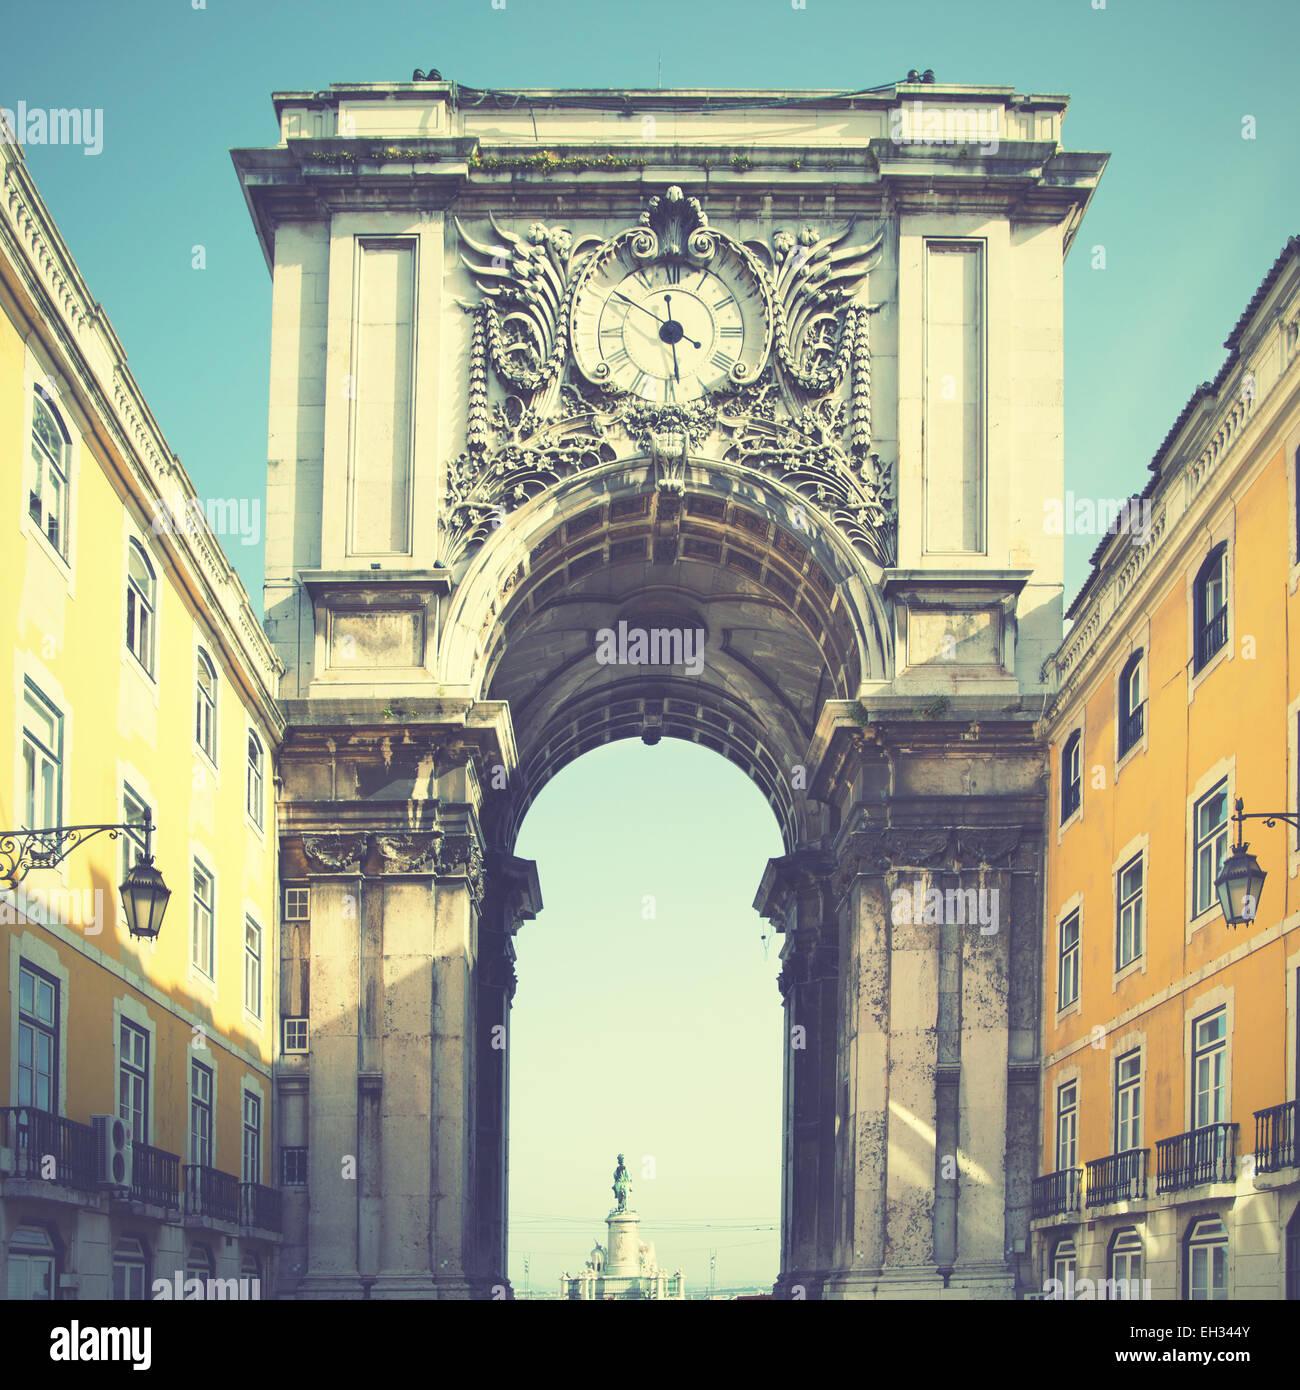 Rua Augusta arch in Lisbon, Portugal. Retro style filtred image - Stock Image